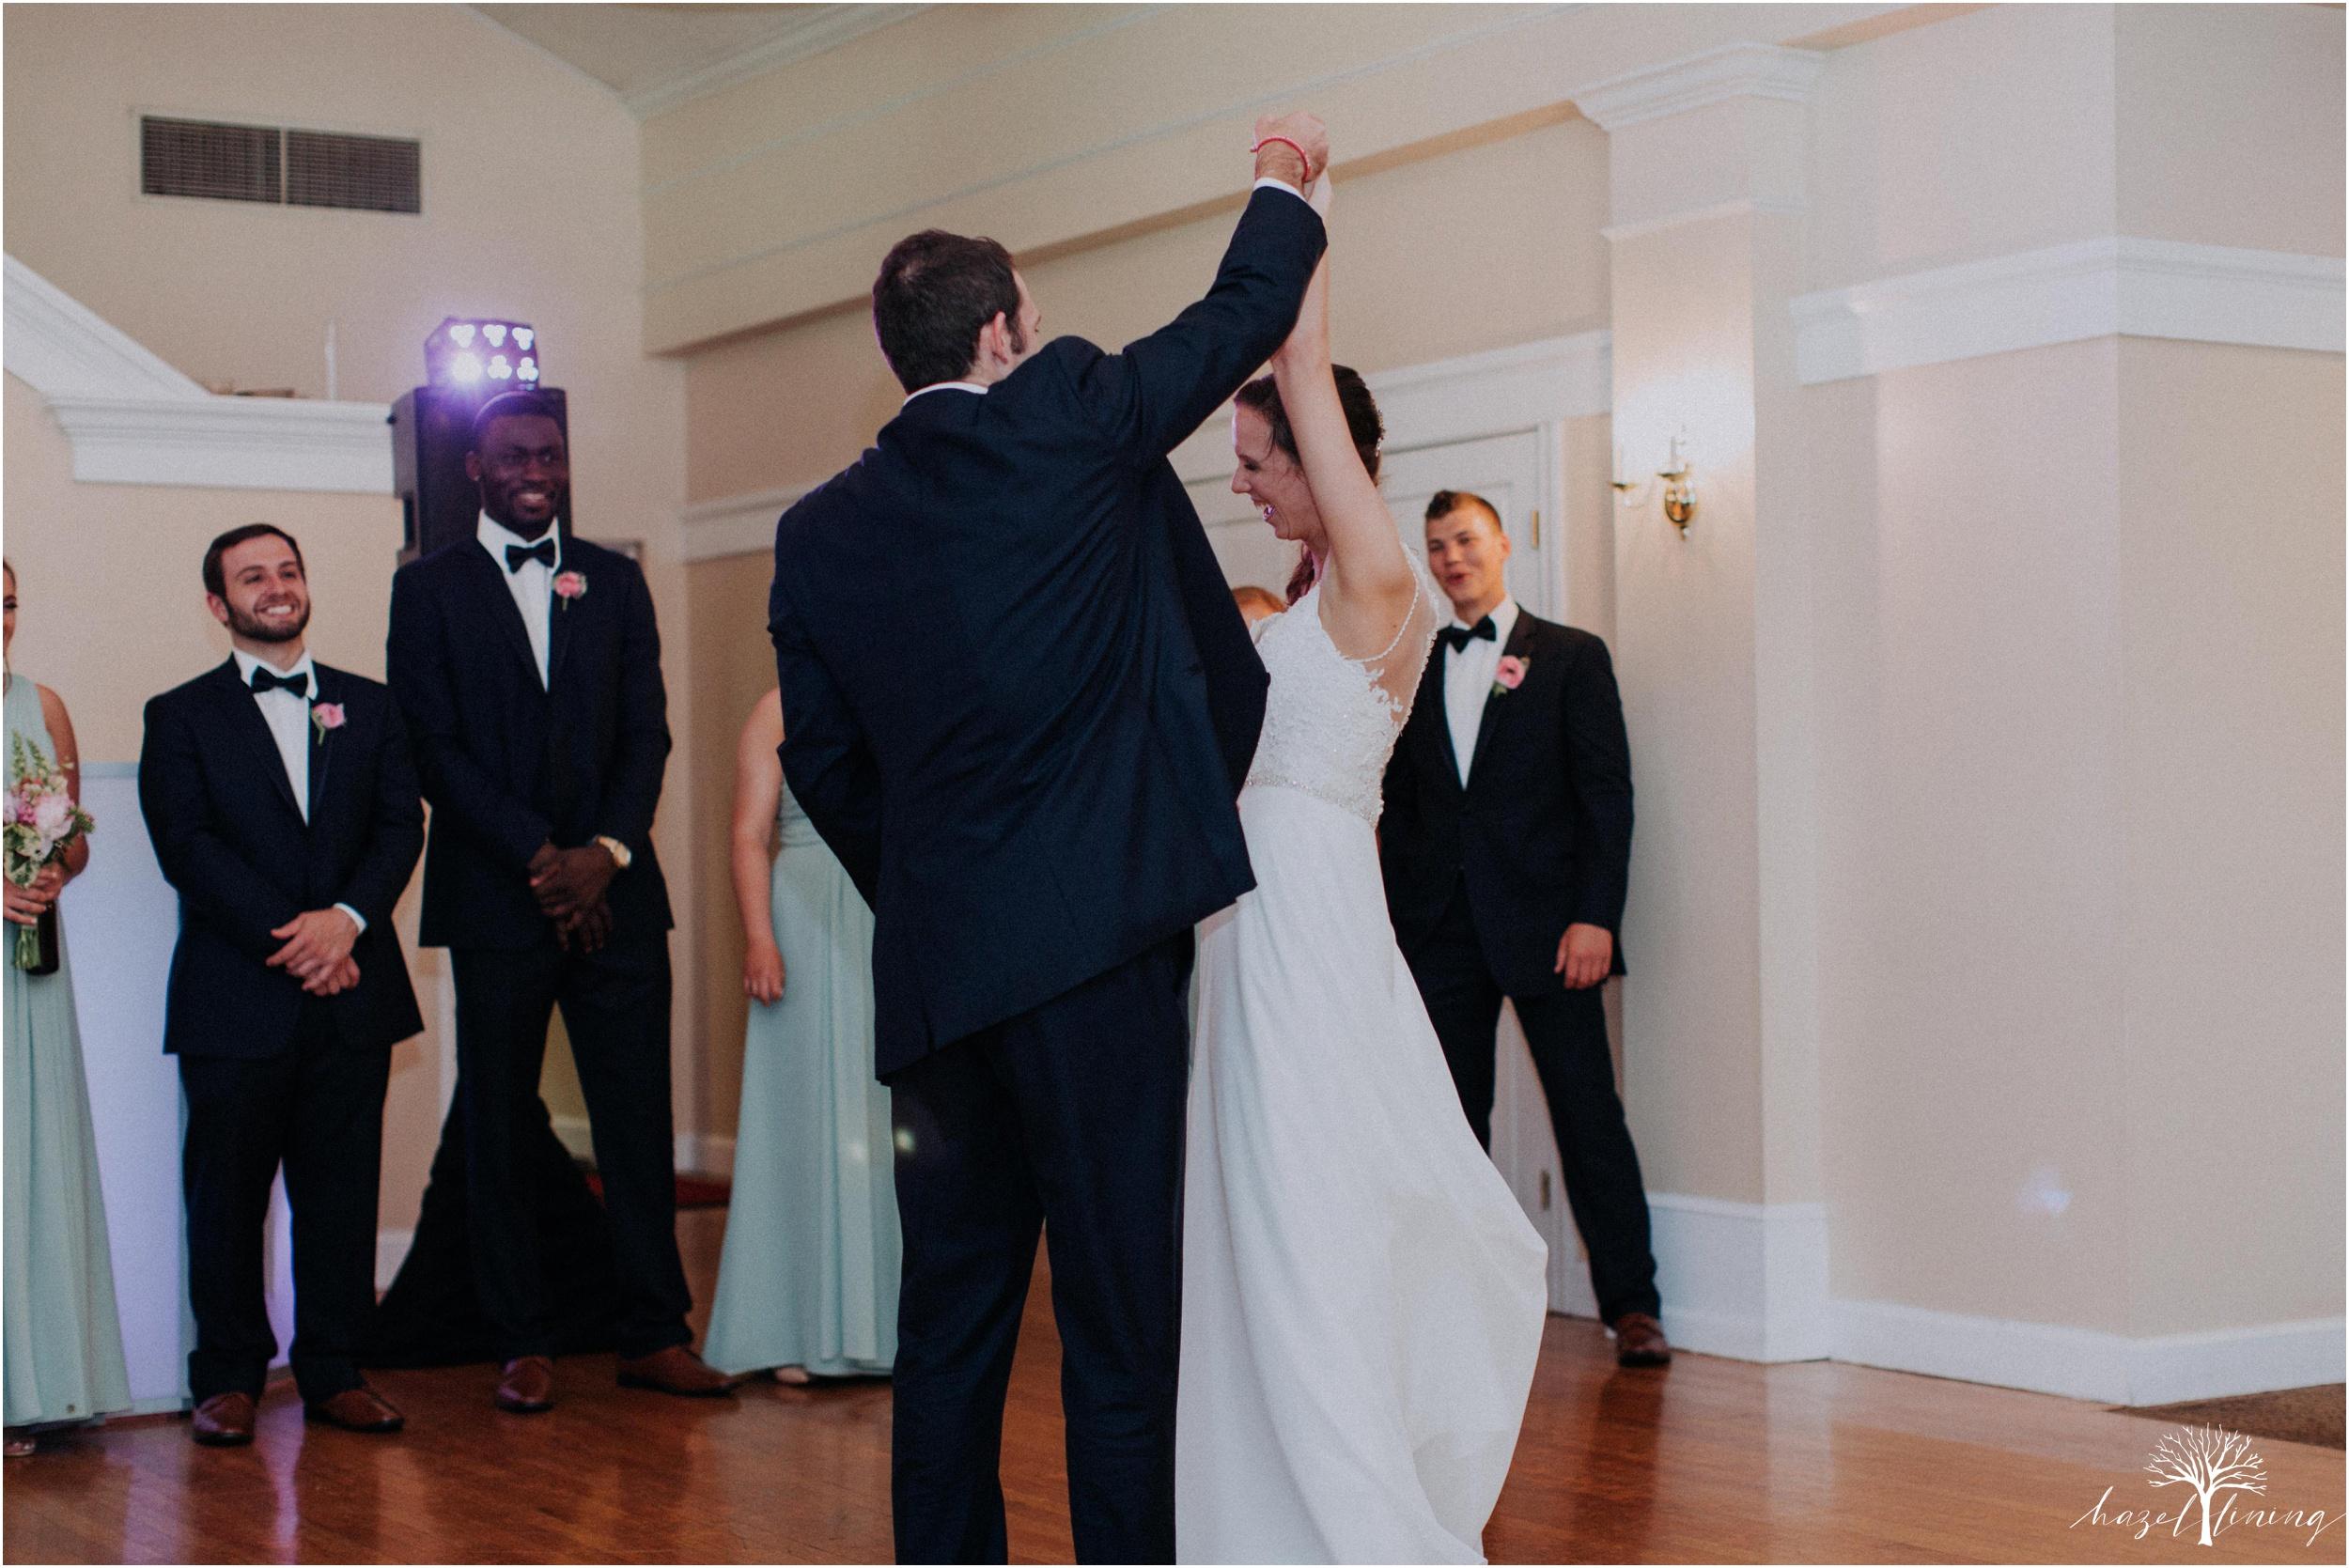 hazel-lining-travel-wedding-elopement-photography_0137.jpg